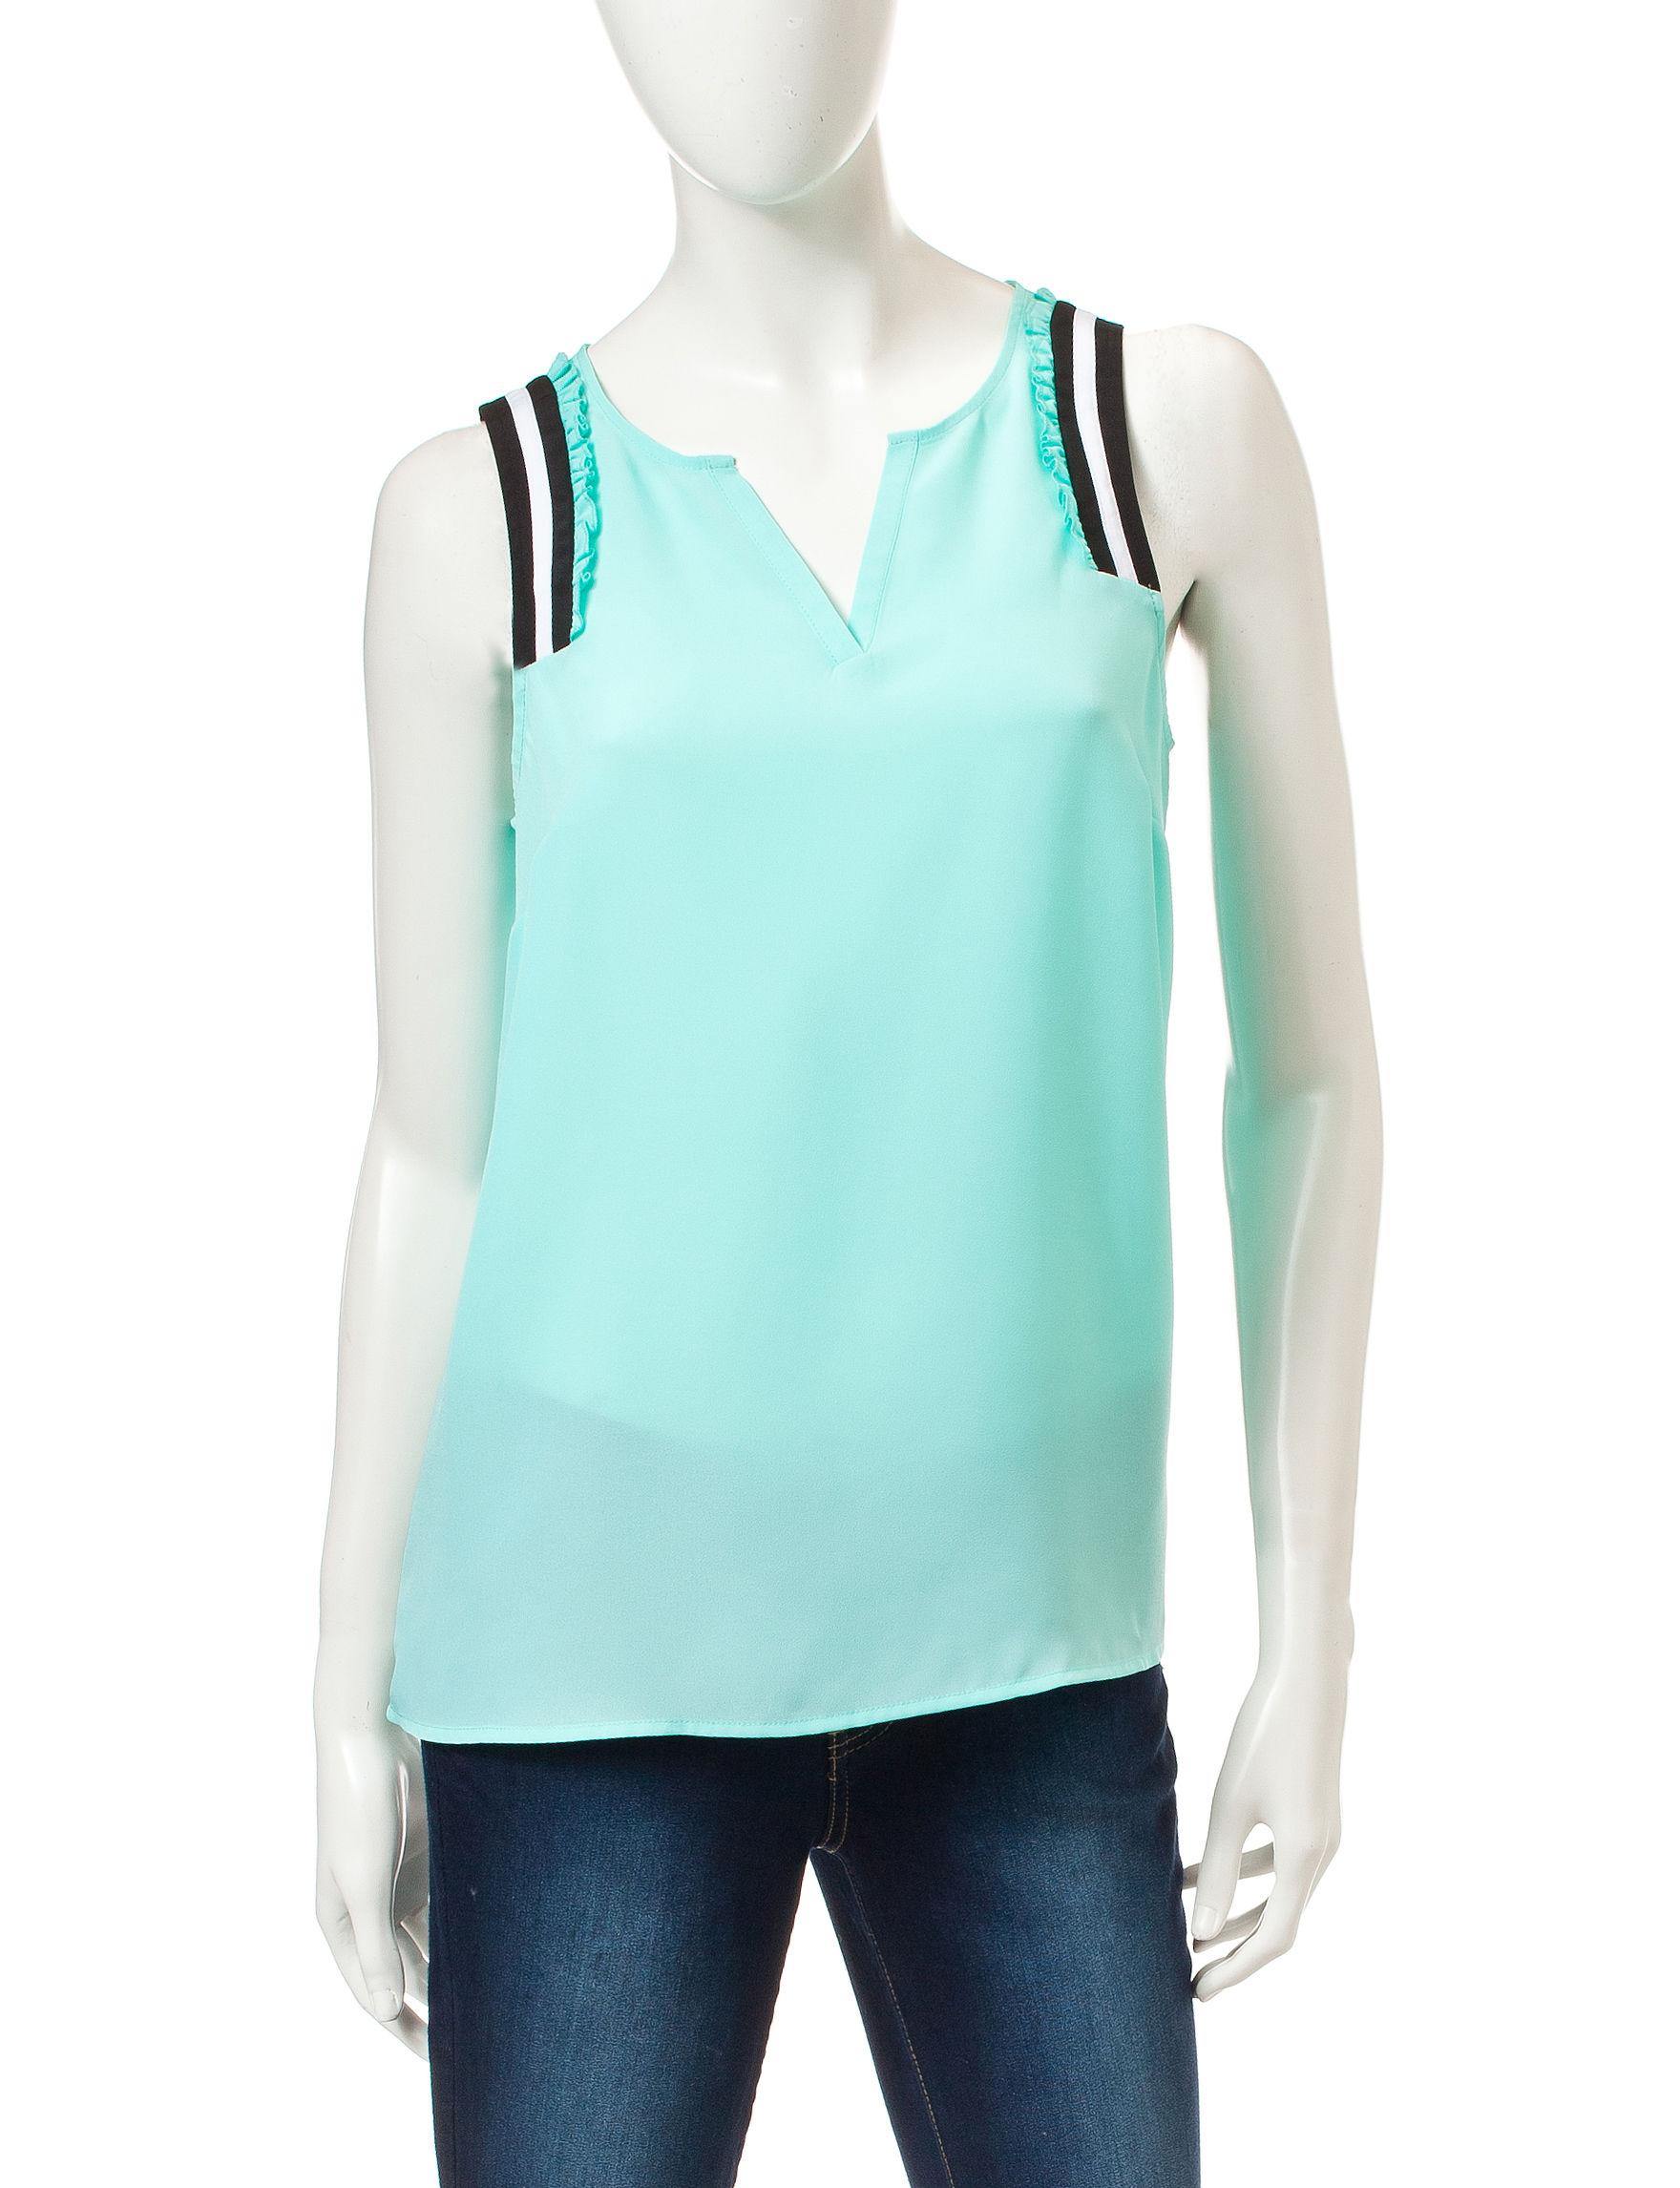 Kensie Blue / Green Shirts & Blouses